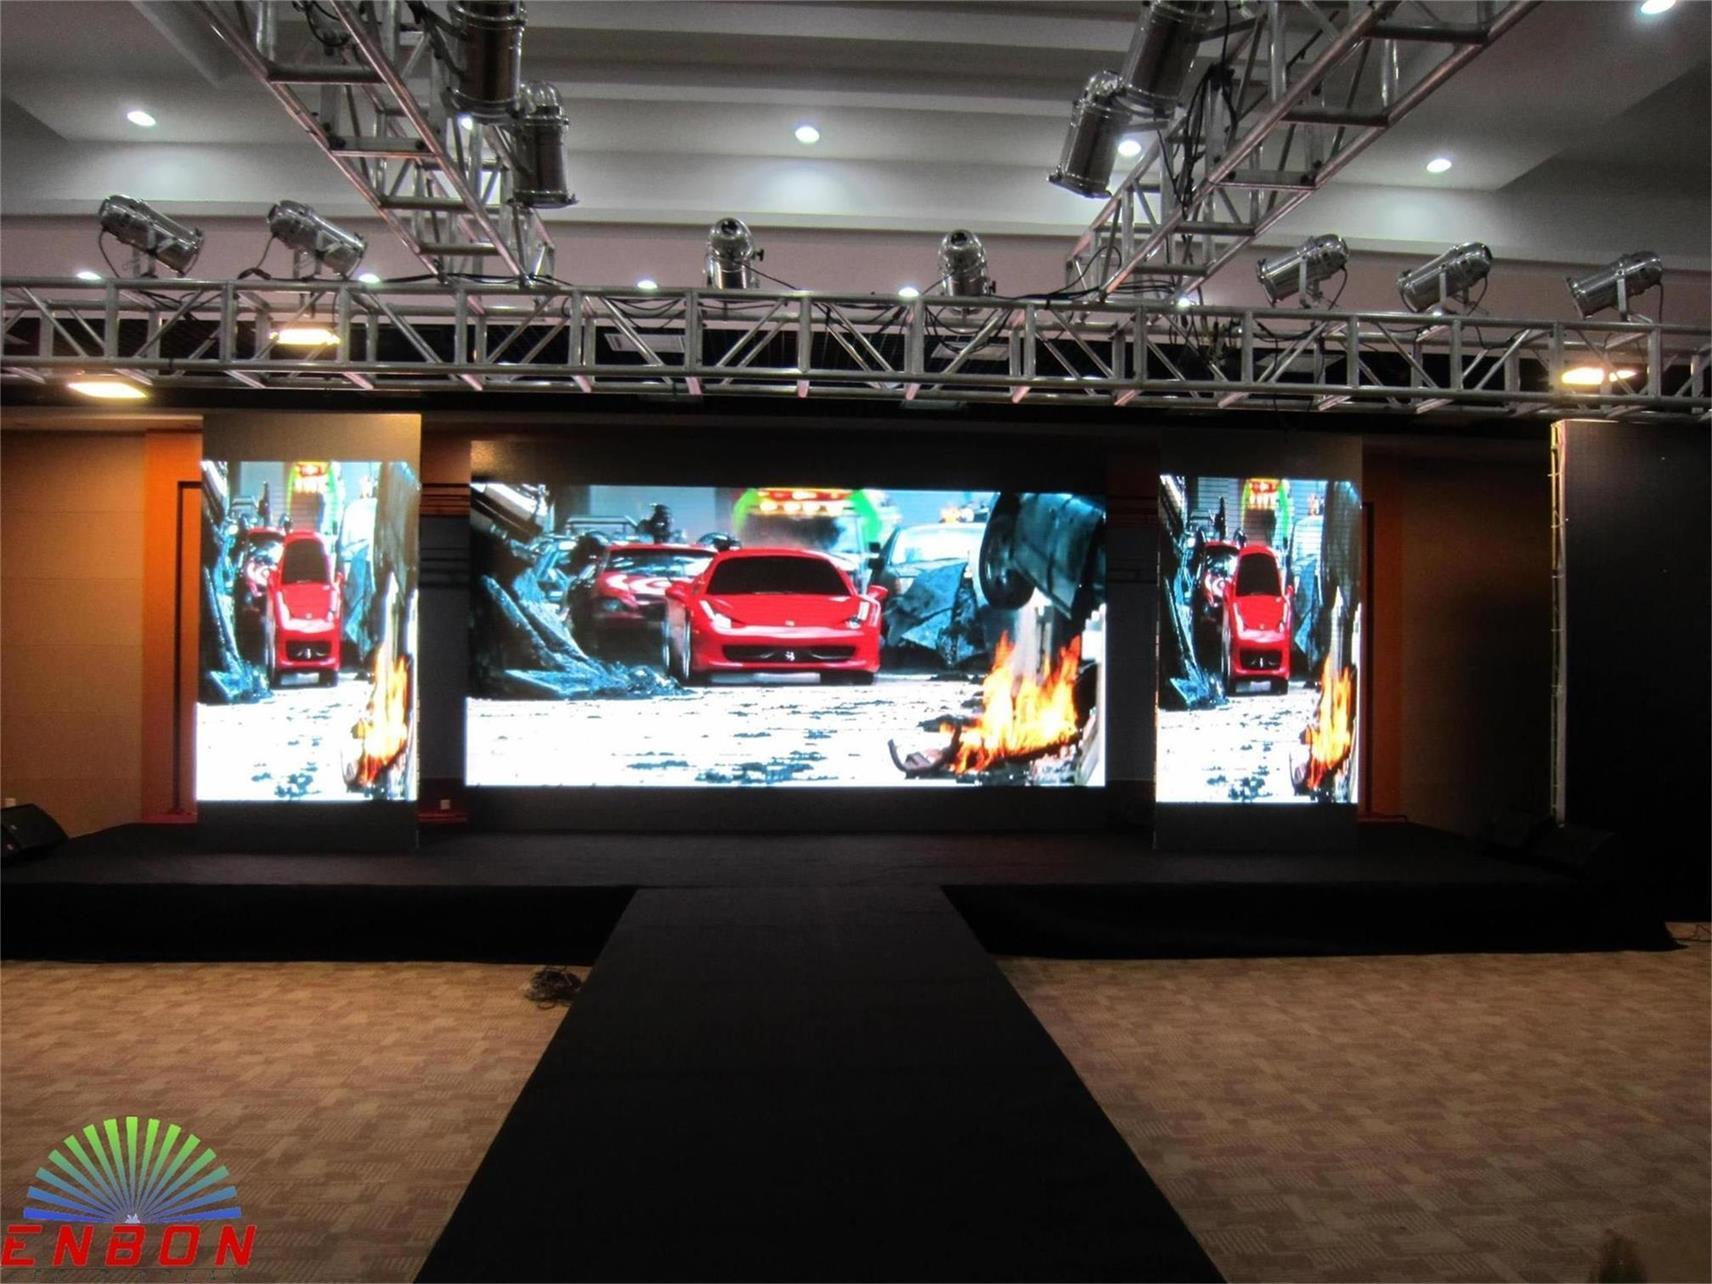 Indoor-High-Contrast-Ratio-LED-Screen-Wall-HD-Video-Display-Board-P3